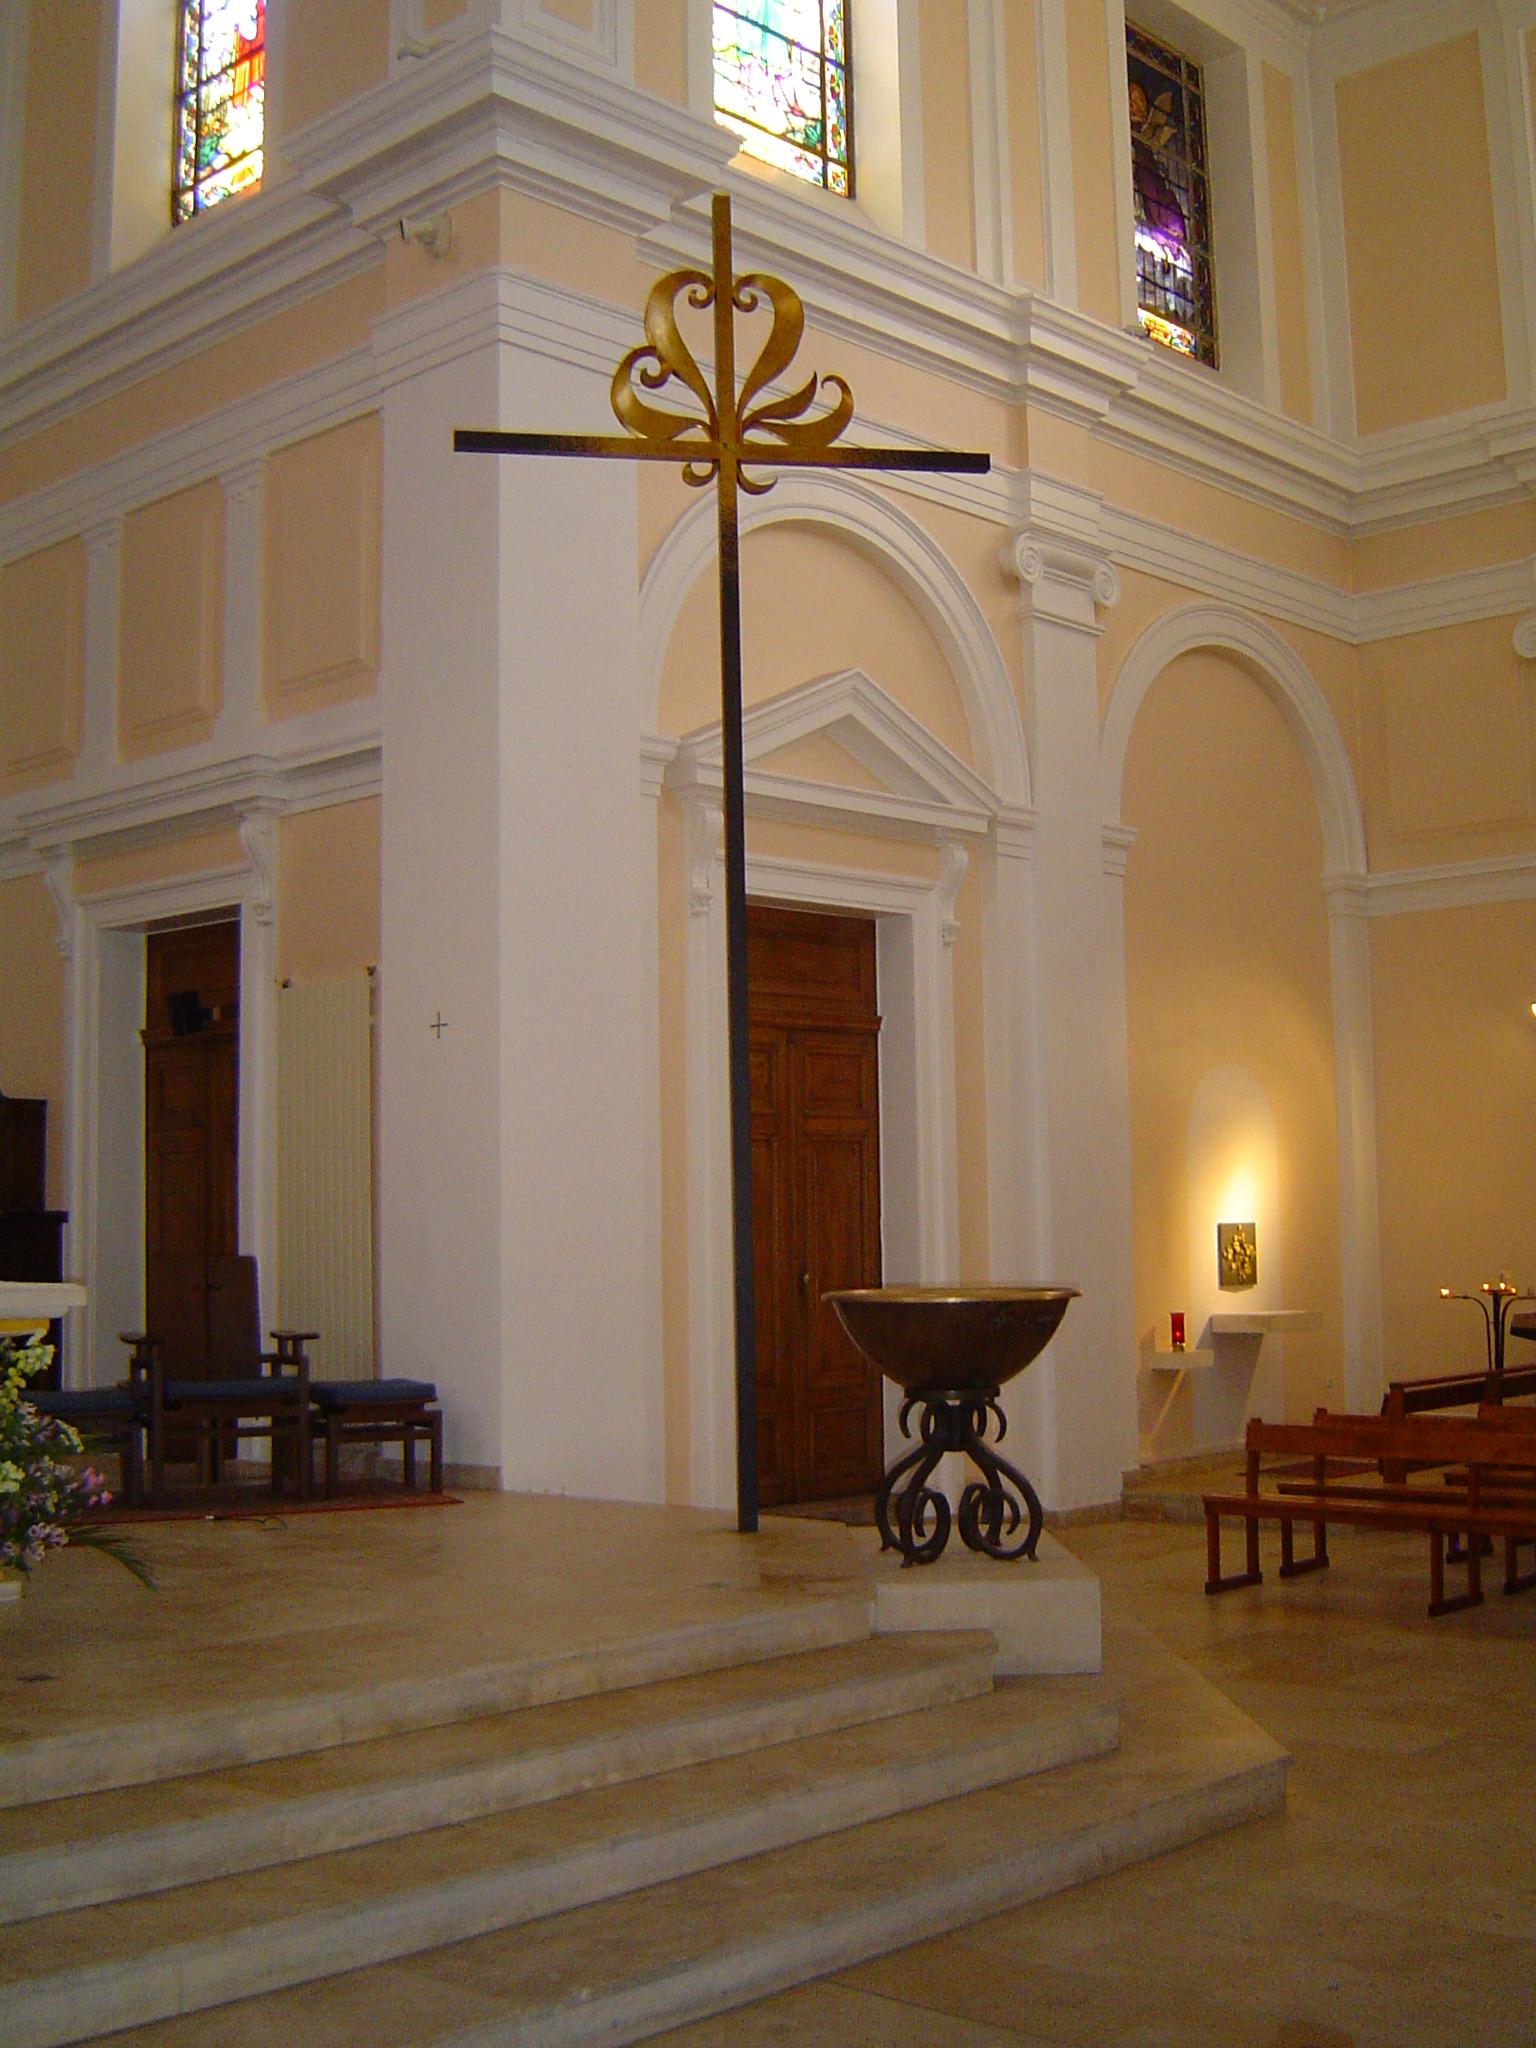 file bourg la reine l 39 glise saint gilles 10 jpg wikimedia commons. Black Bedroom Furniture Sets. Home Design Ideas